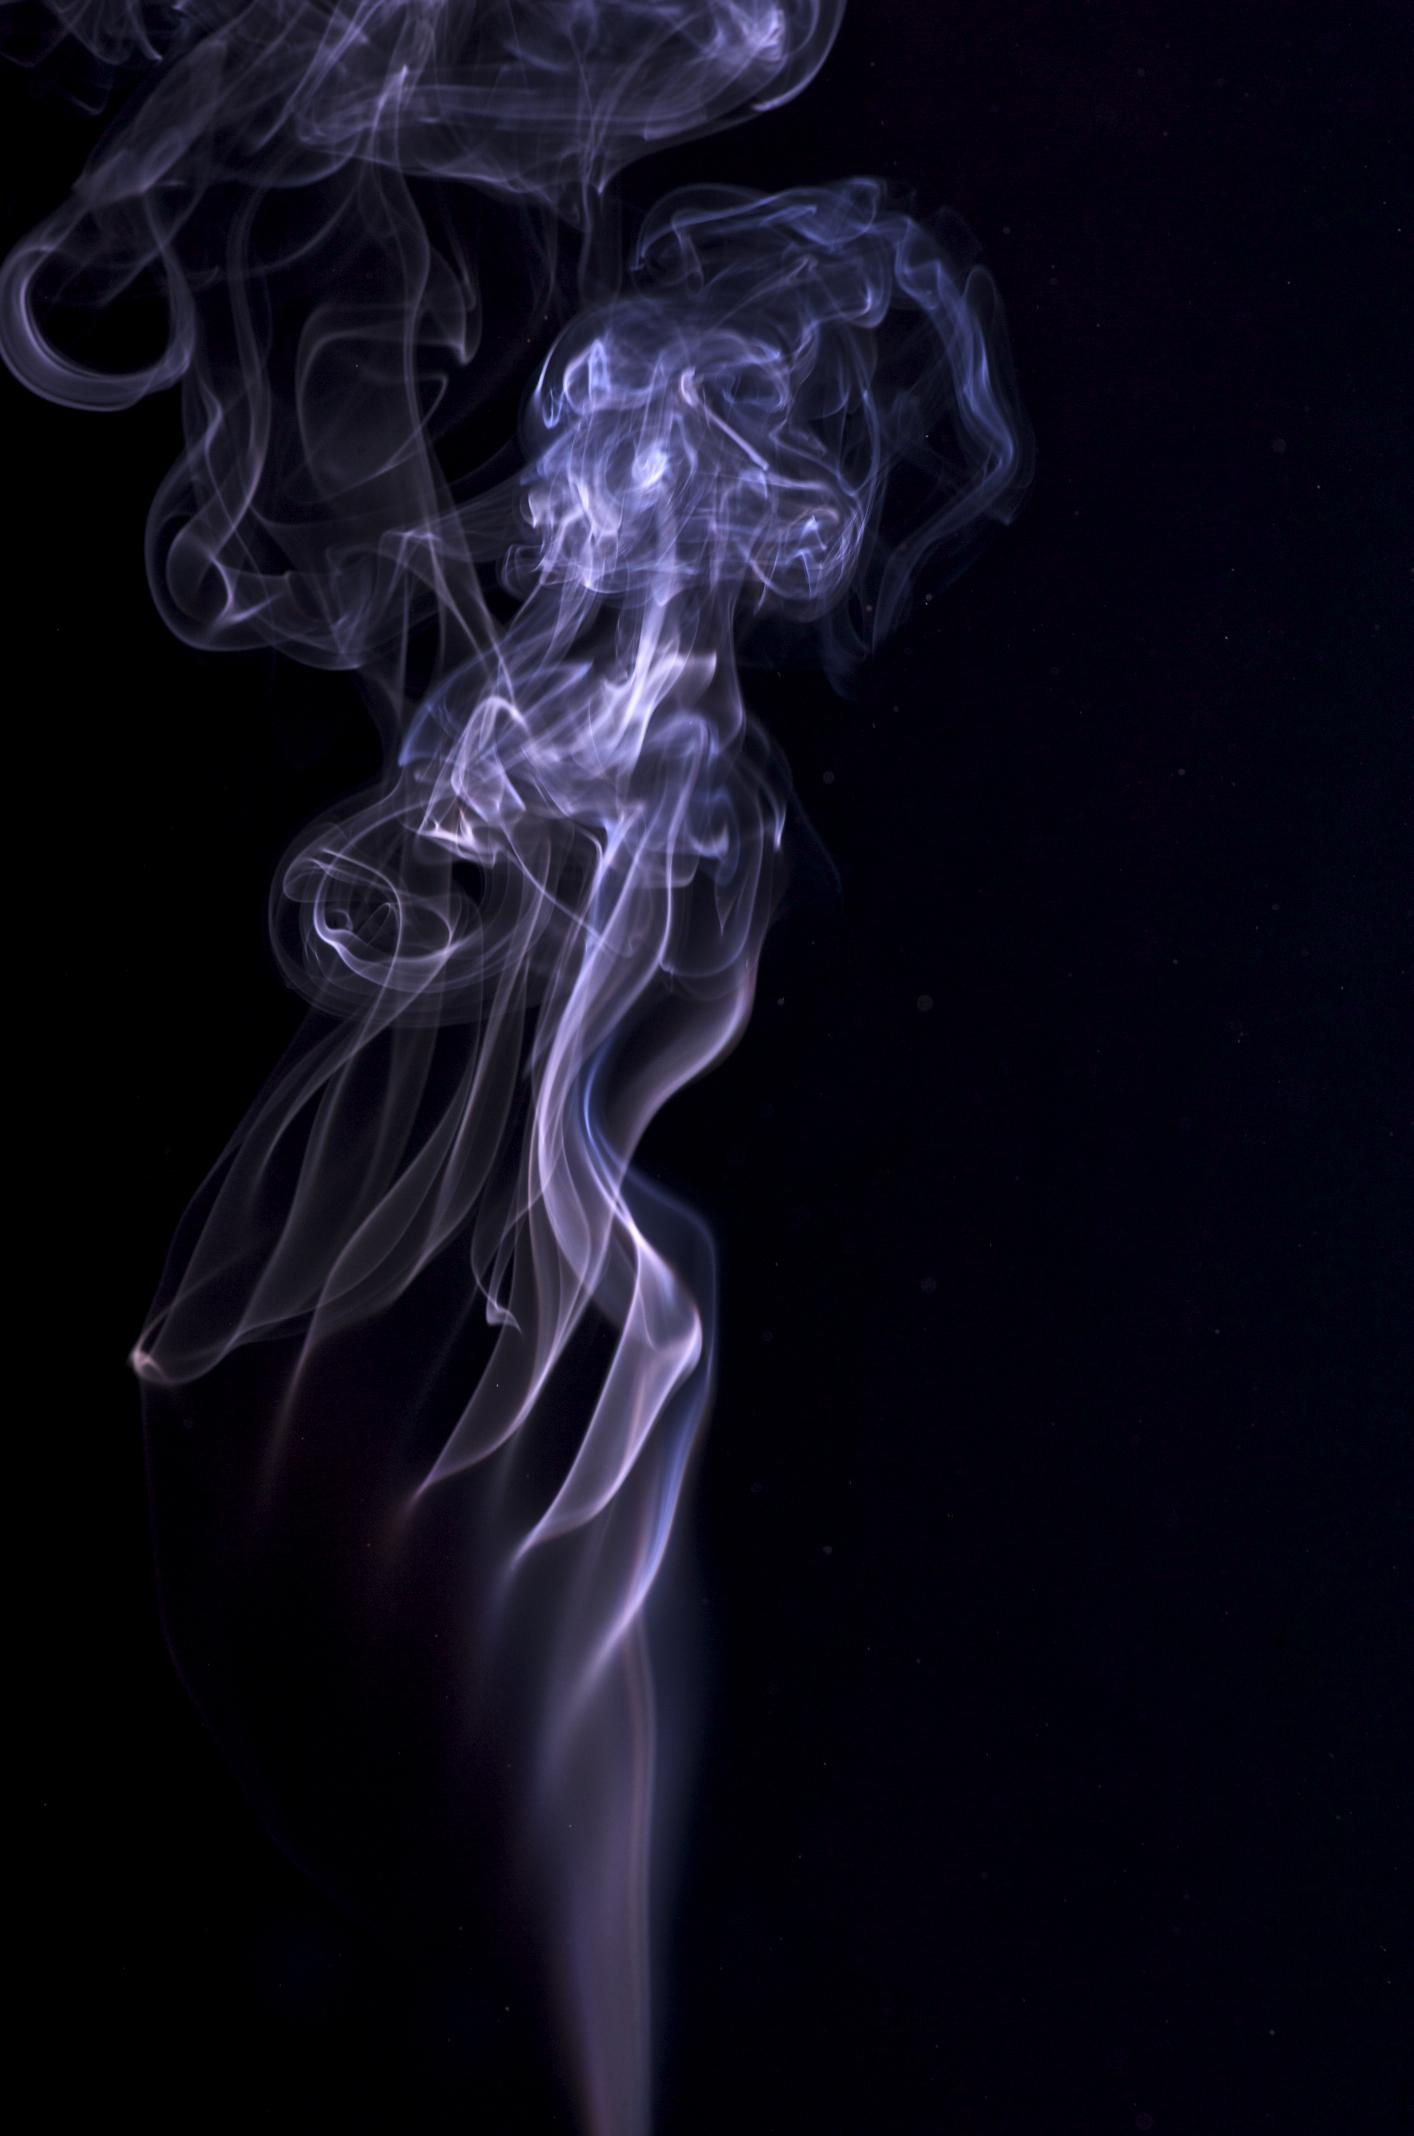 File:Smoke by THOR.jpg - Wikimedia Commons